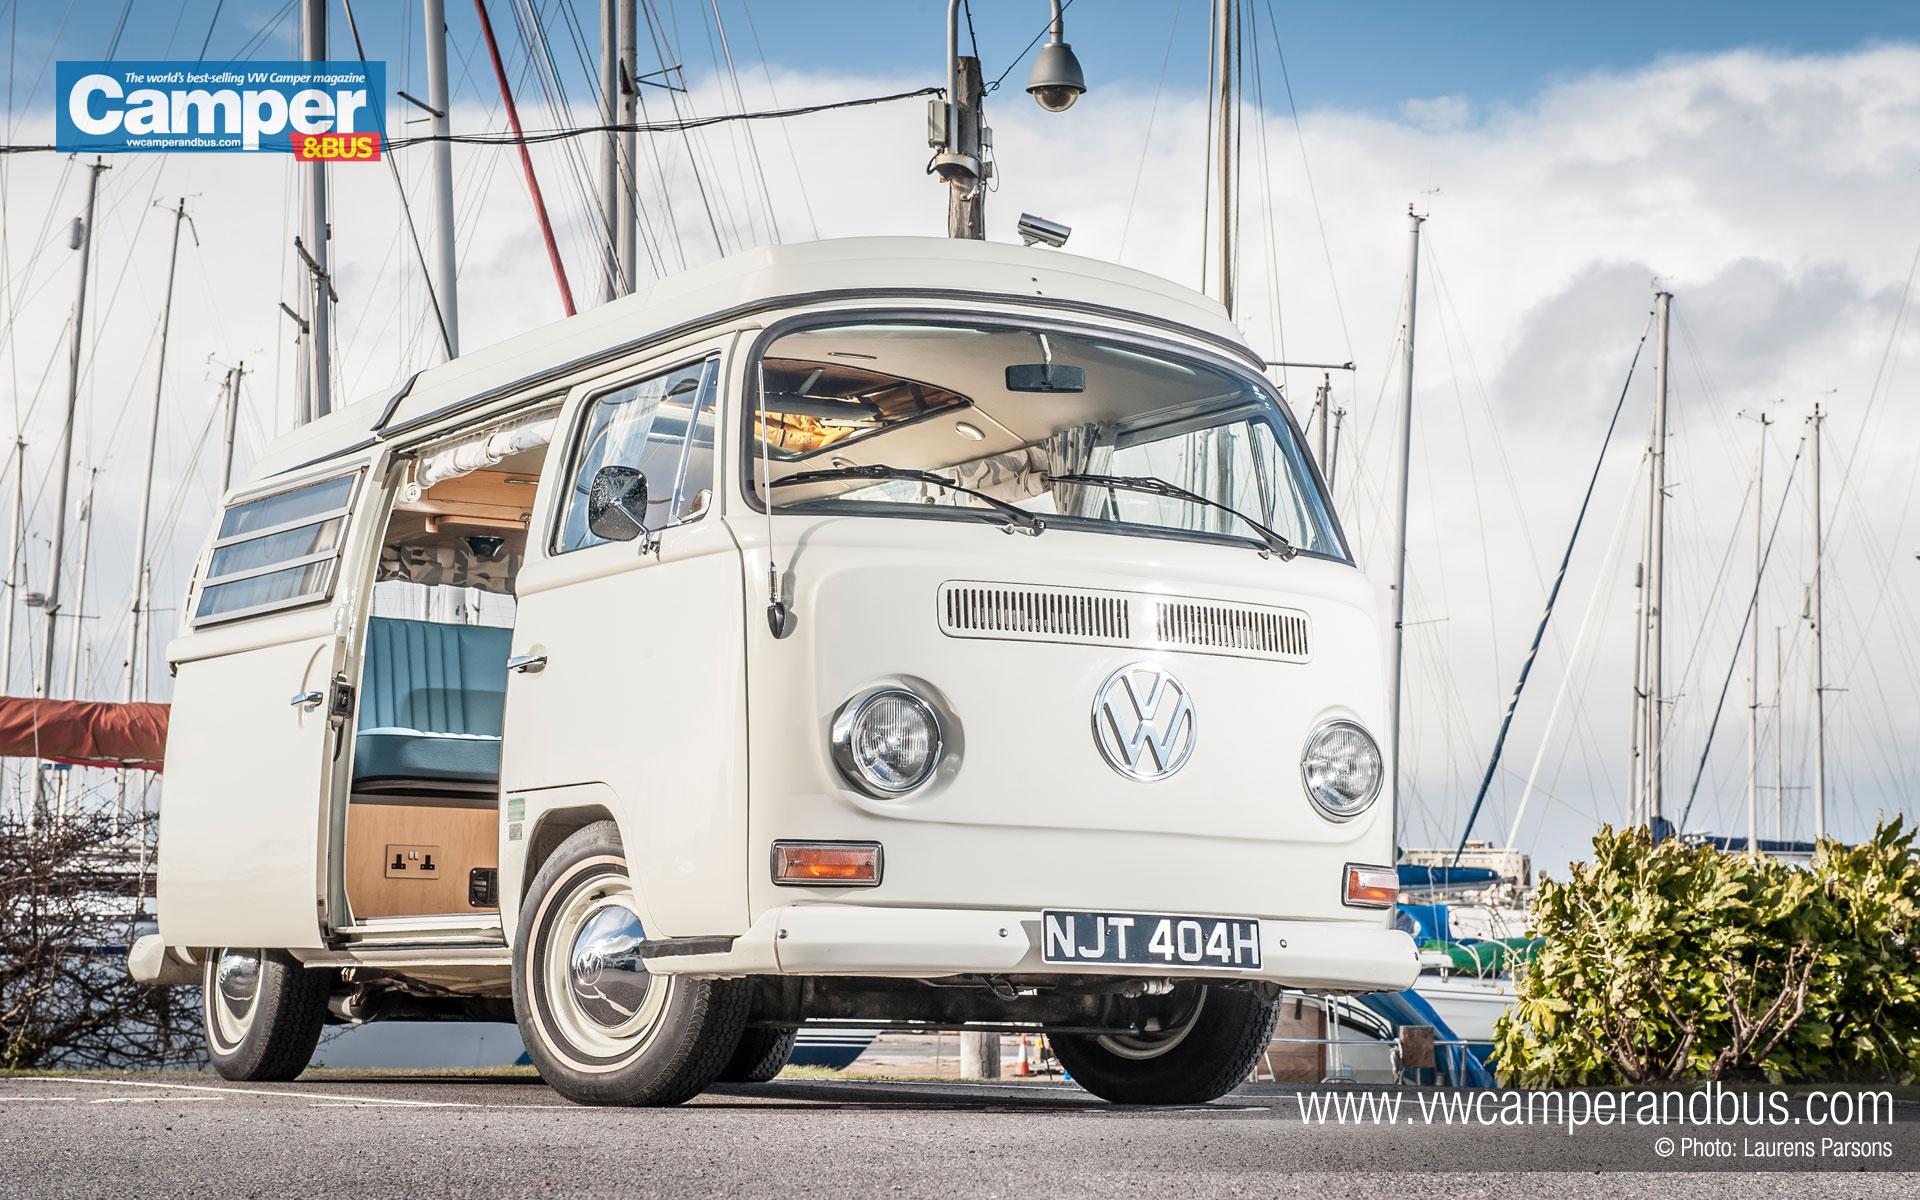 Bay Window Westfalia Campervan desktop wallpaper   VW Camper and Bus 1920x1200